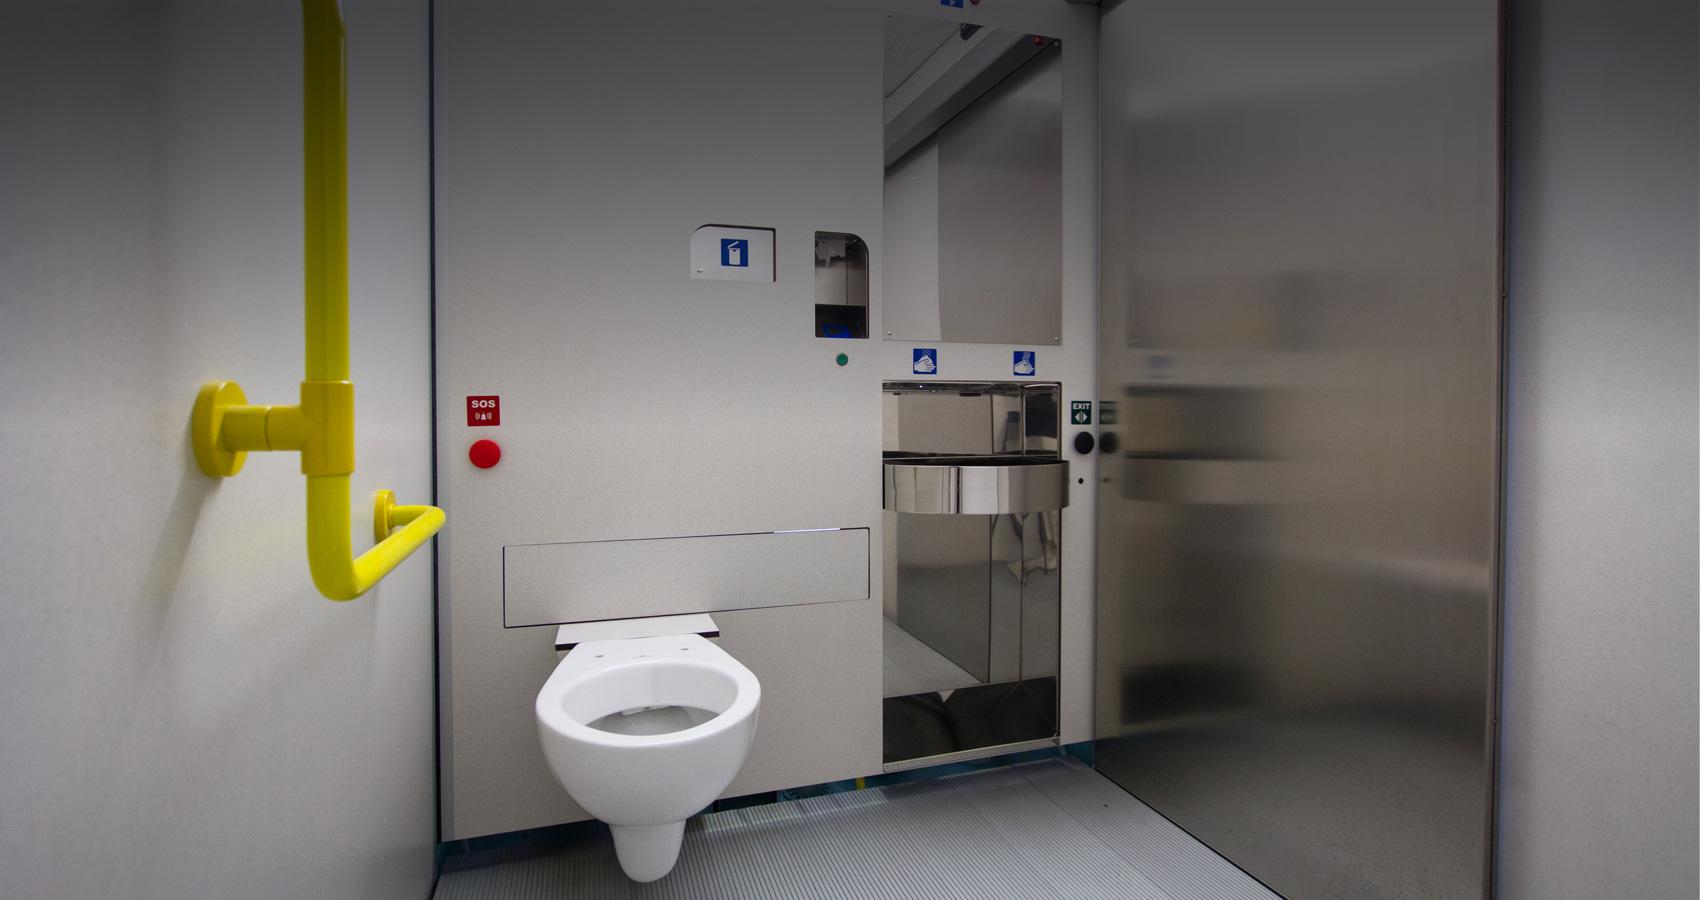 Pulizia ed igiene